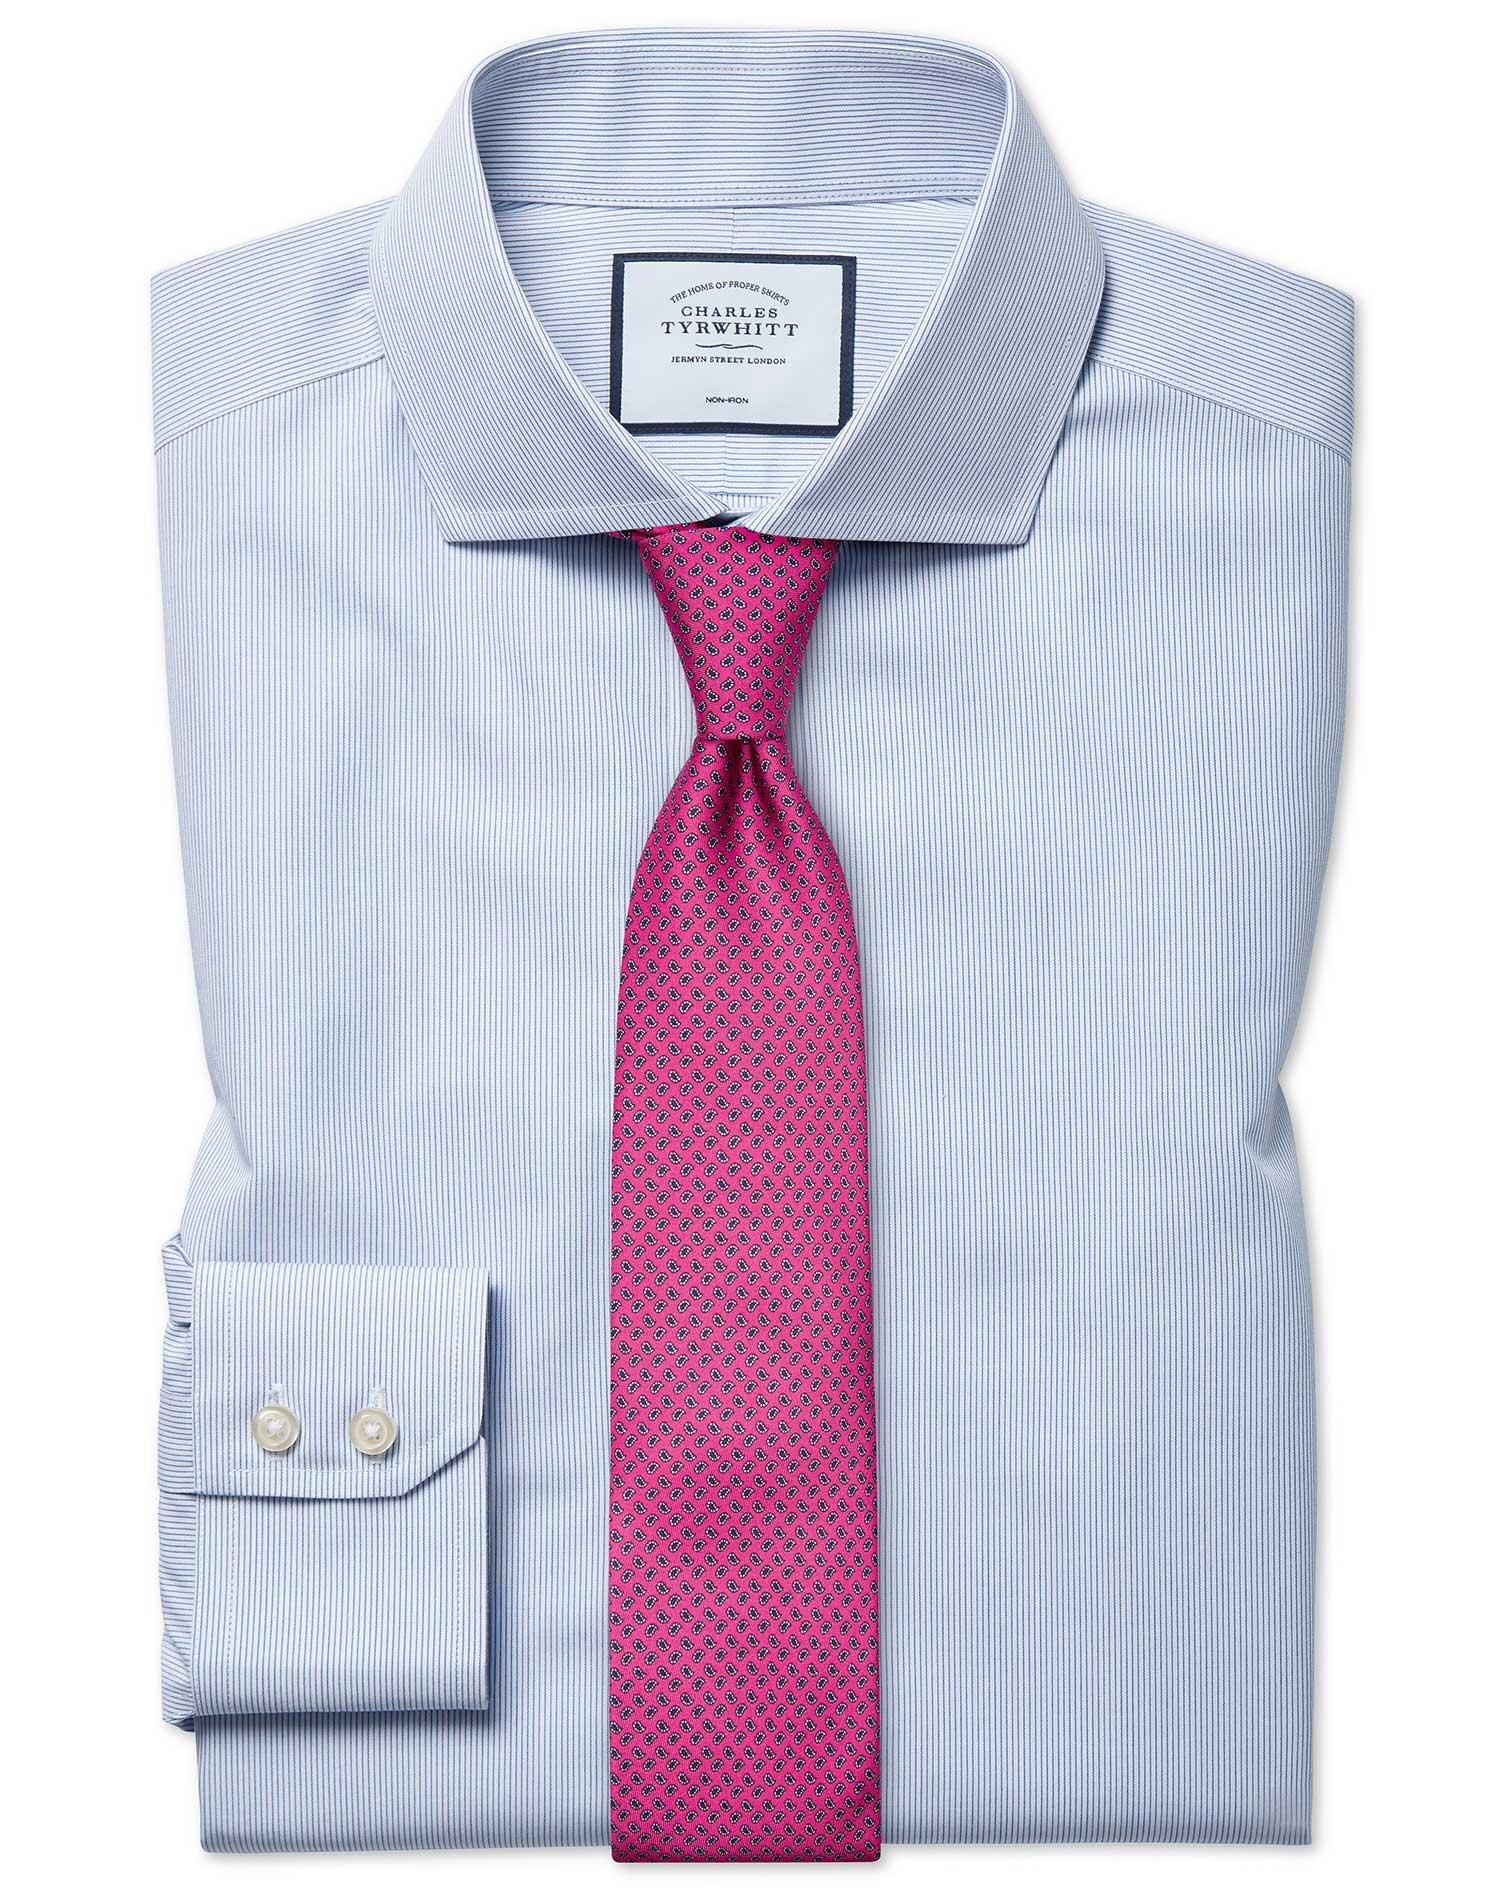 Extra Slim Fit Non-Iron Blue Stripe Tyrwhitt Cool Cotton Formal Shirt Single Cuff Size 16/36 by Char